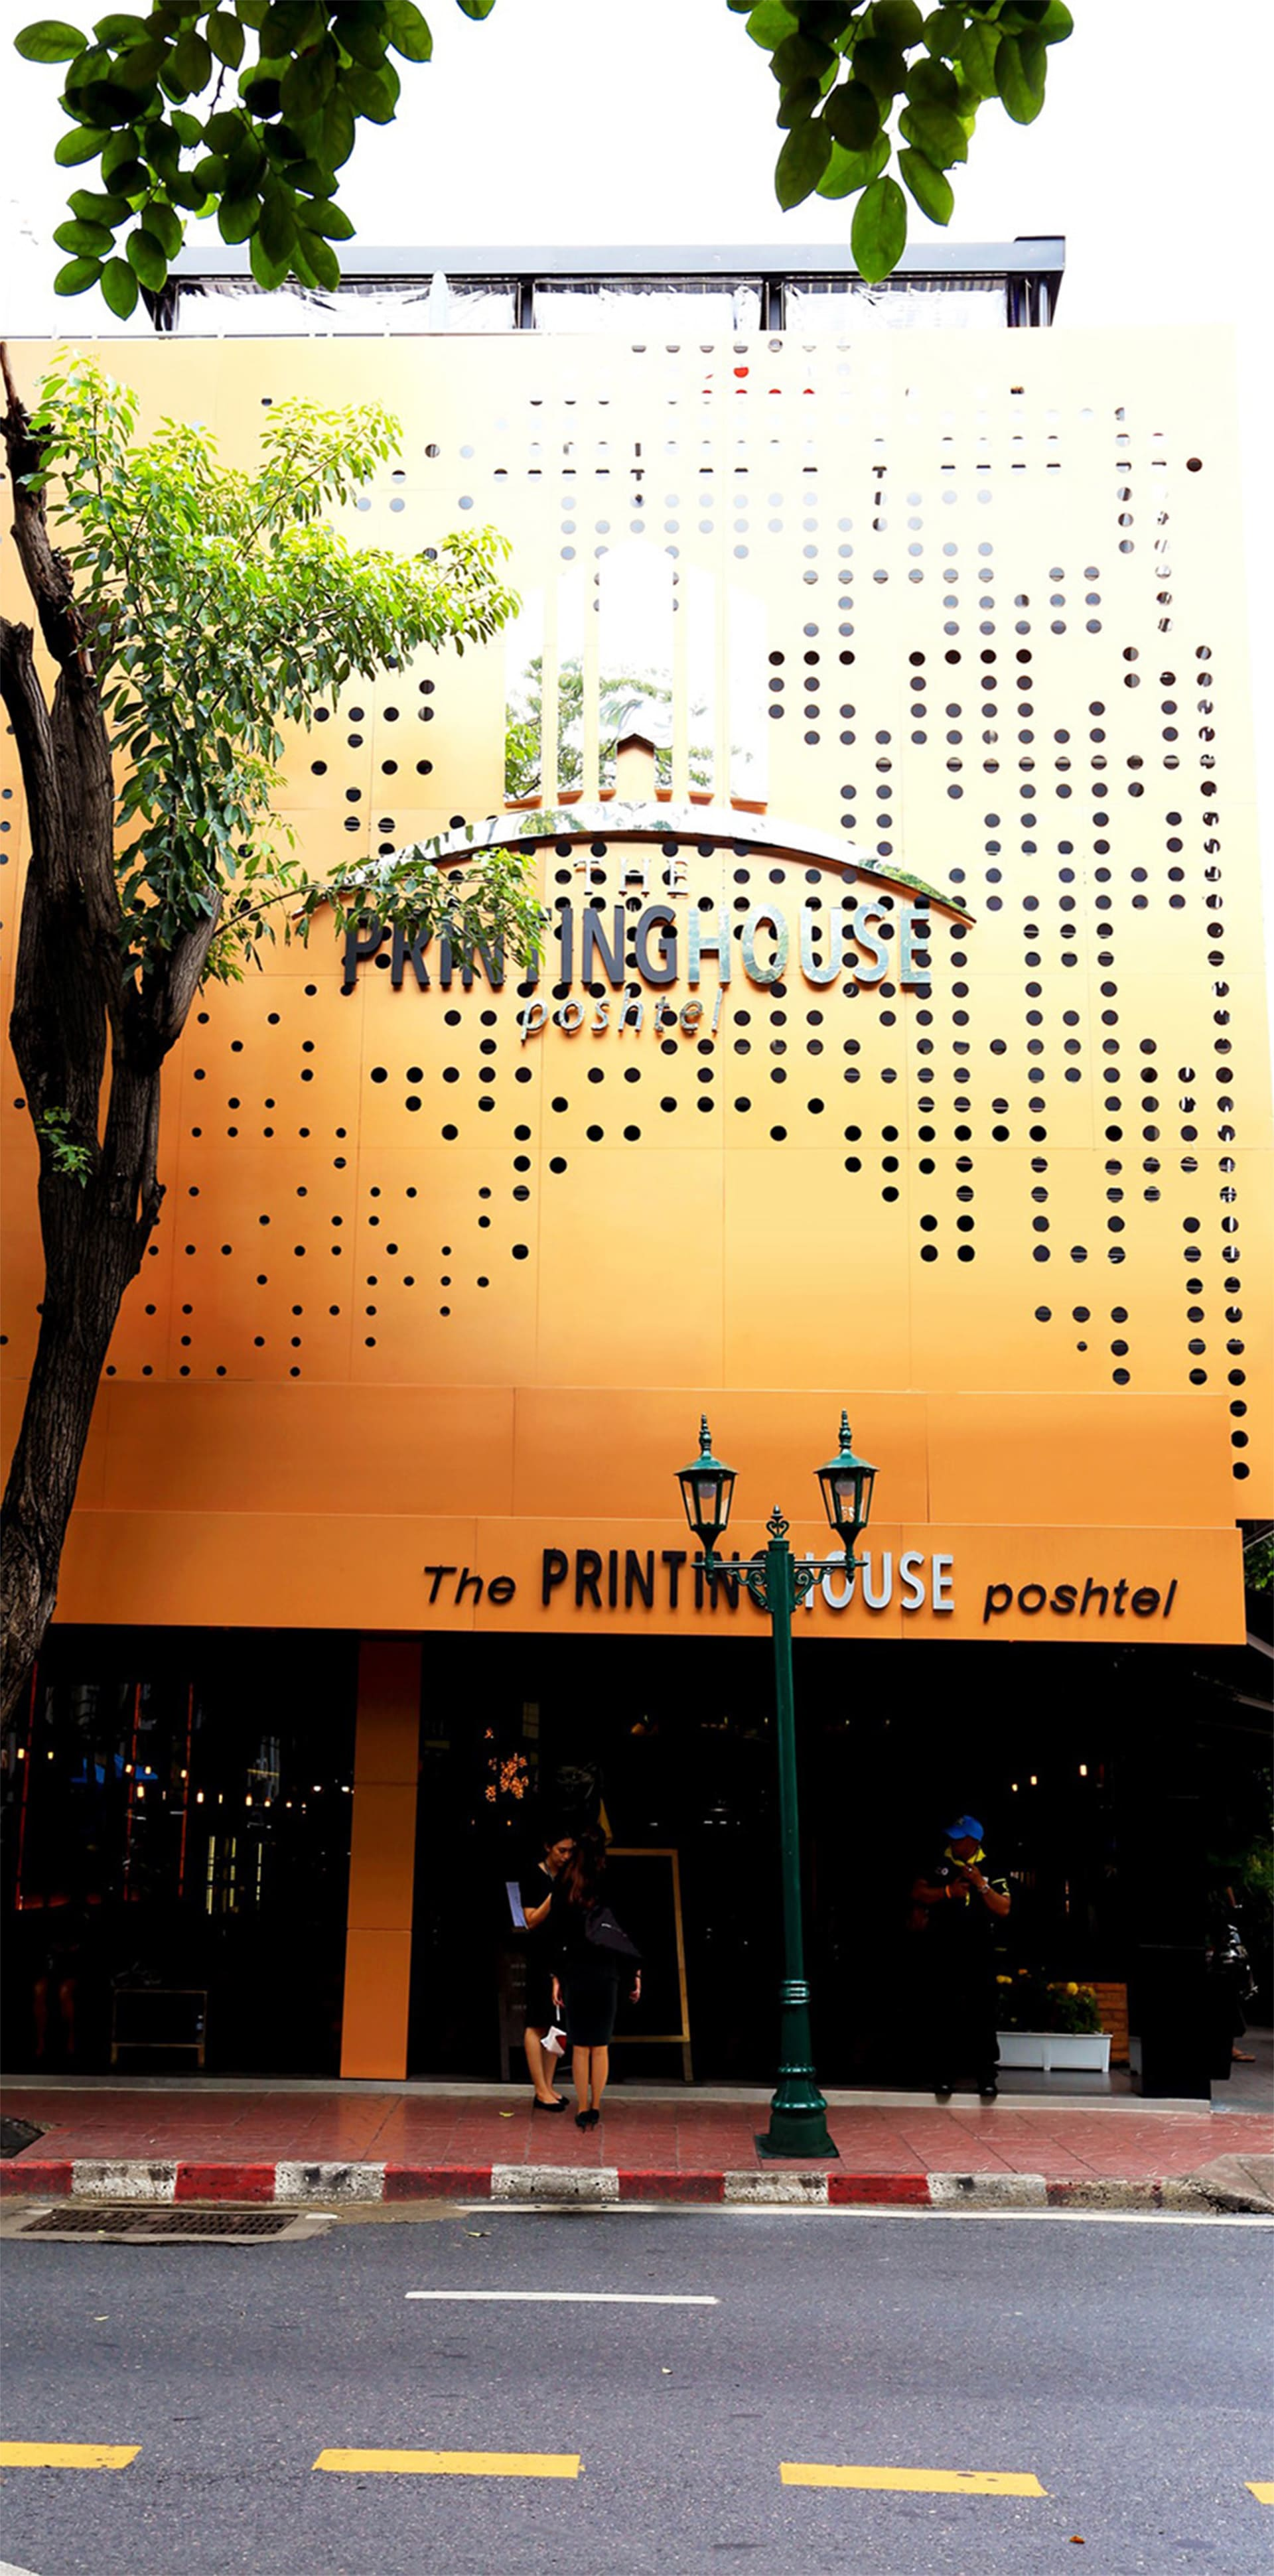 HOSTEL - The Printing House Poshtel